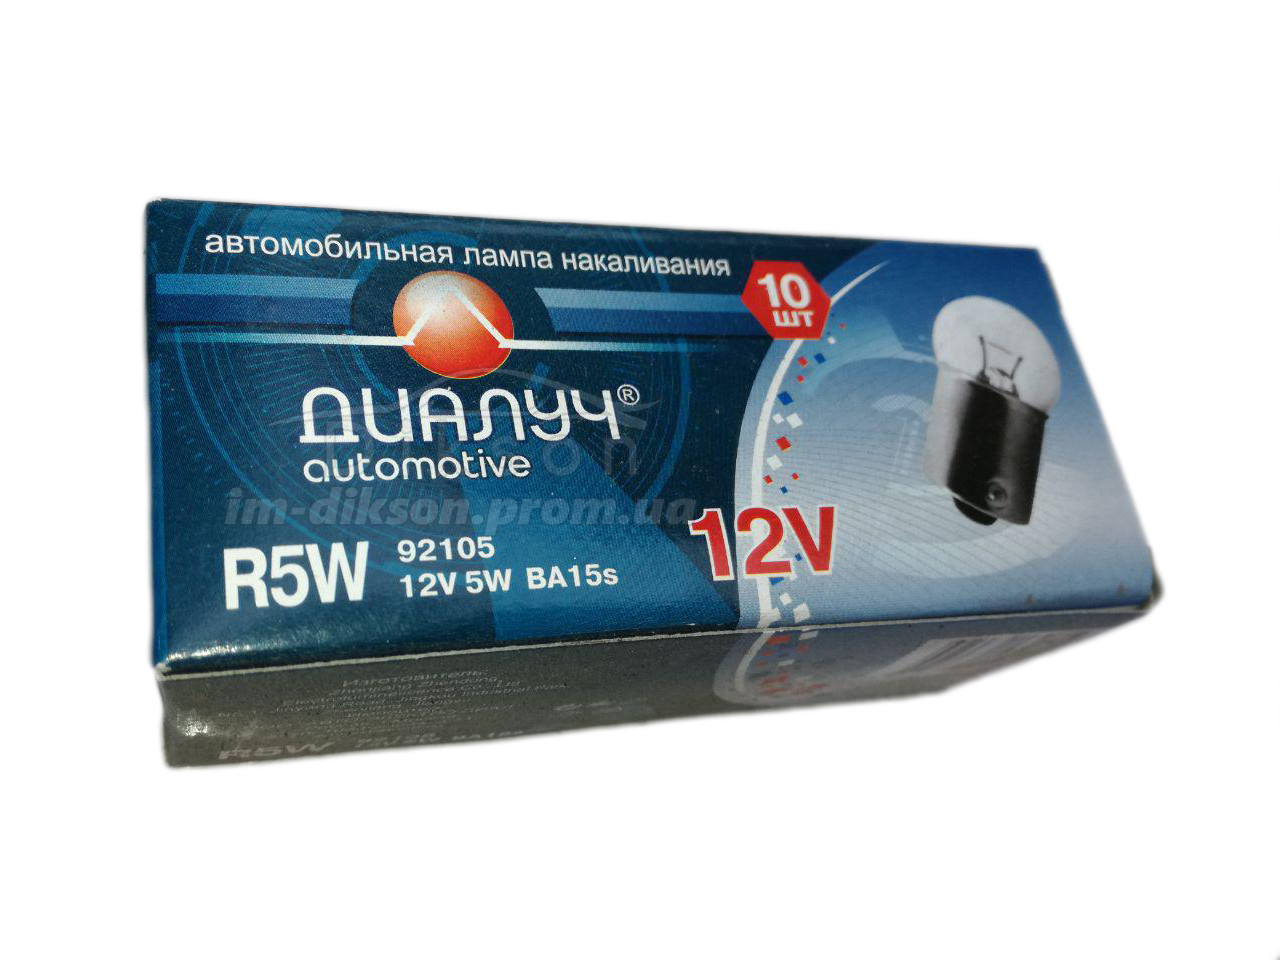 Лампочка Диалуч 24V 5W BA15S R5W